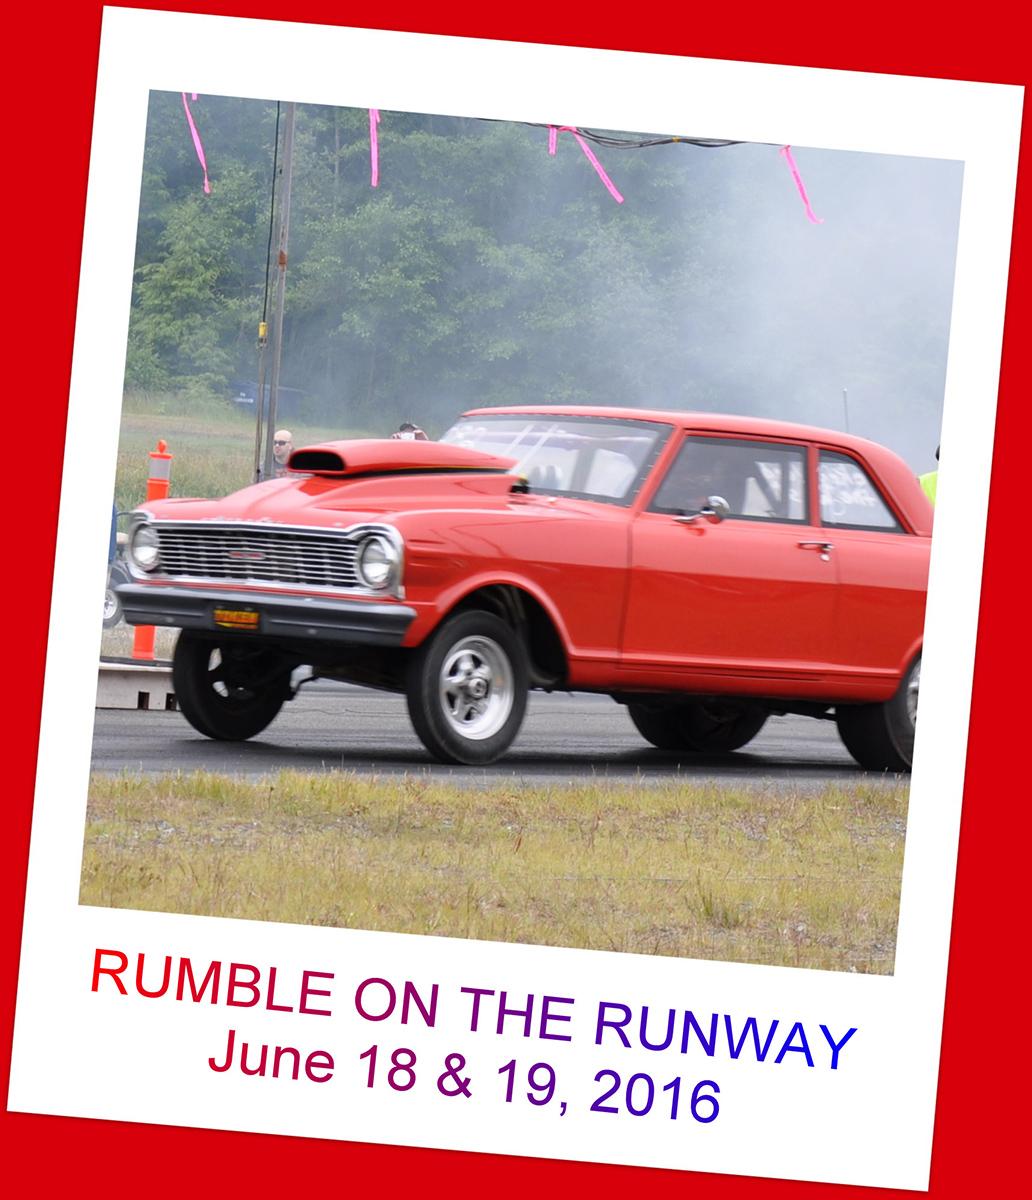 Rumble on the Runway June 18 & 19, 2016 913